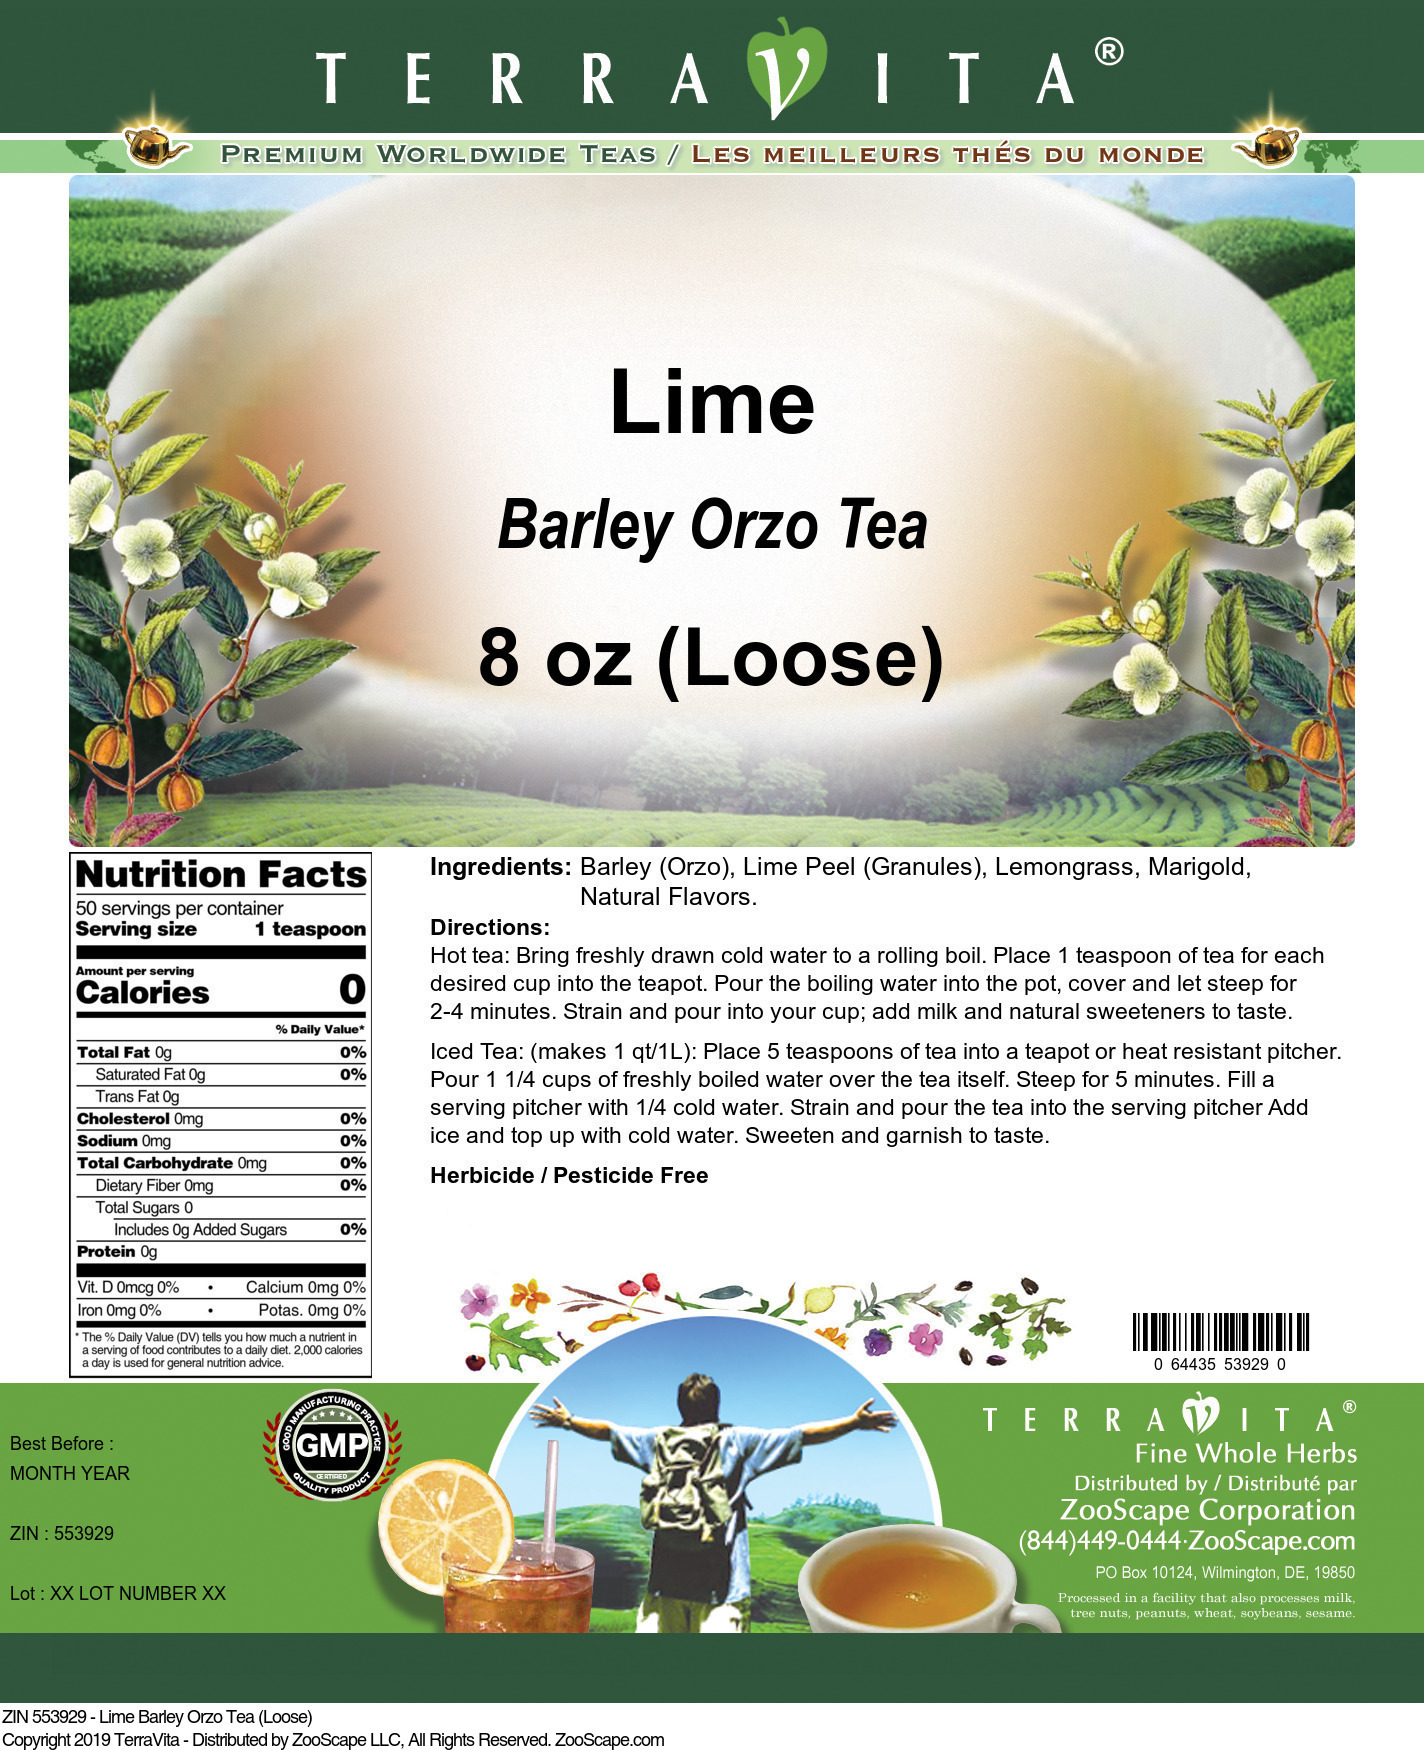 Lime Barley Orzo Tea (Loose)